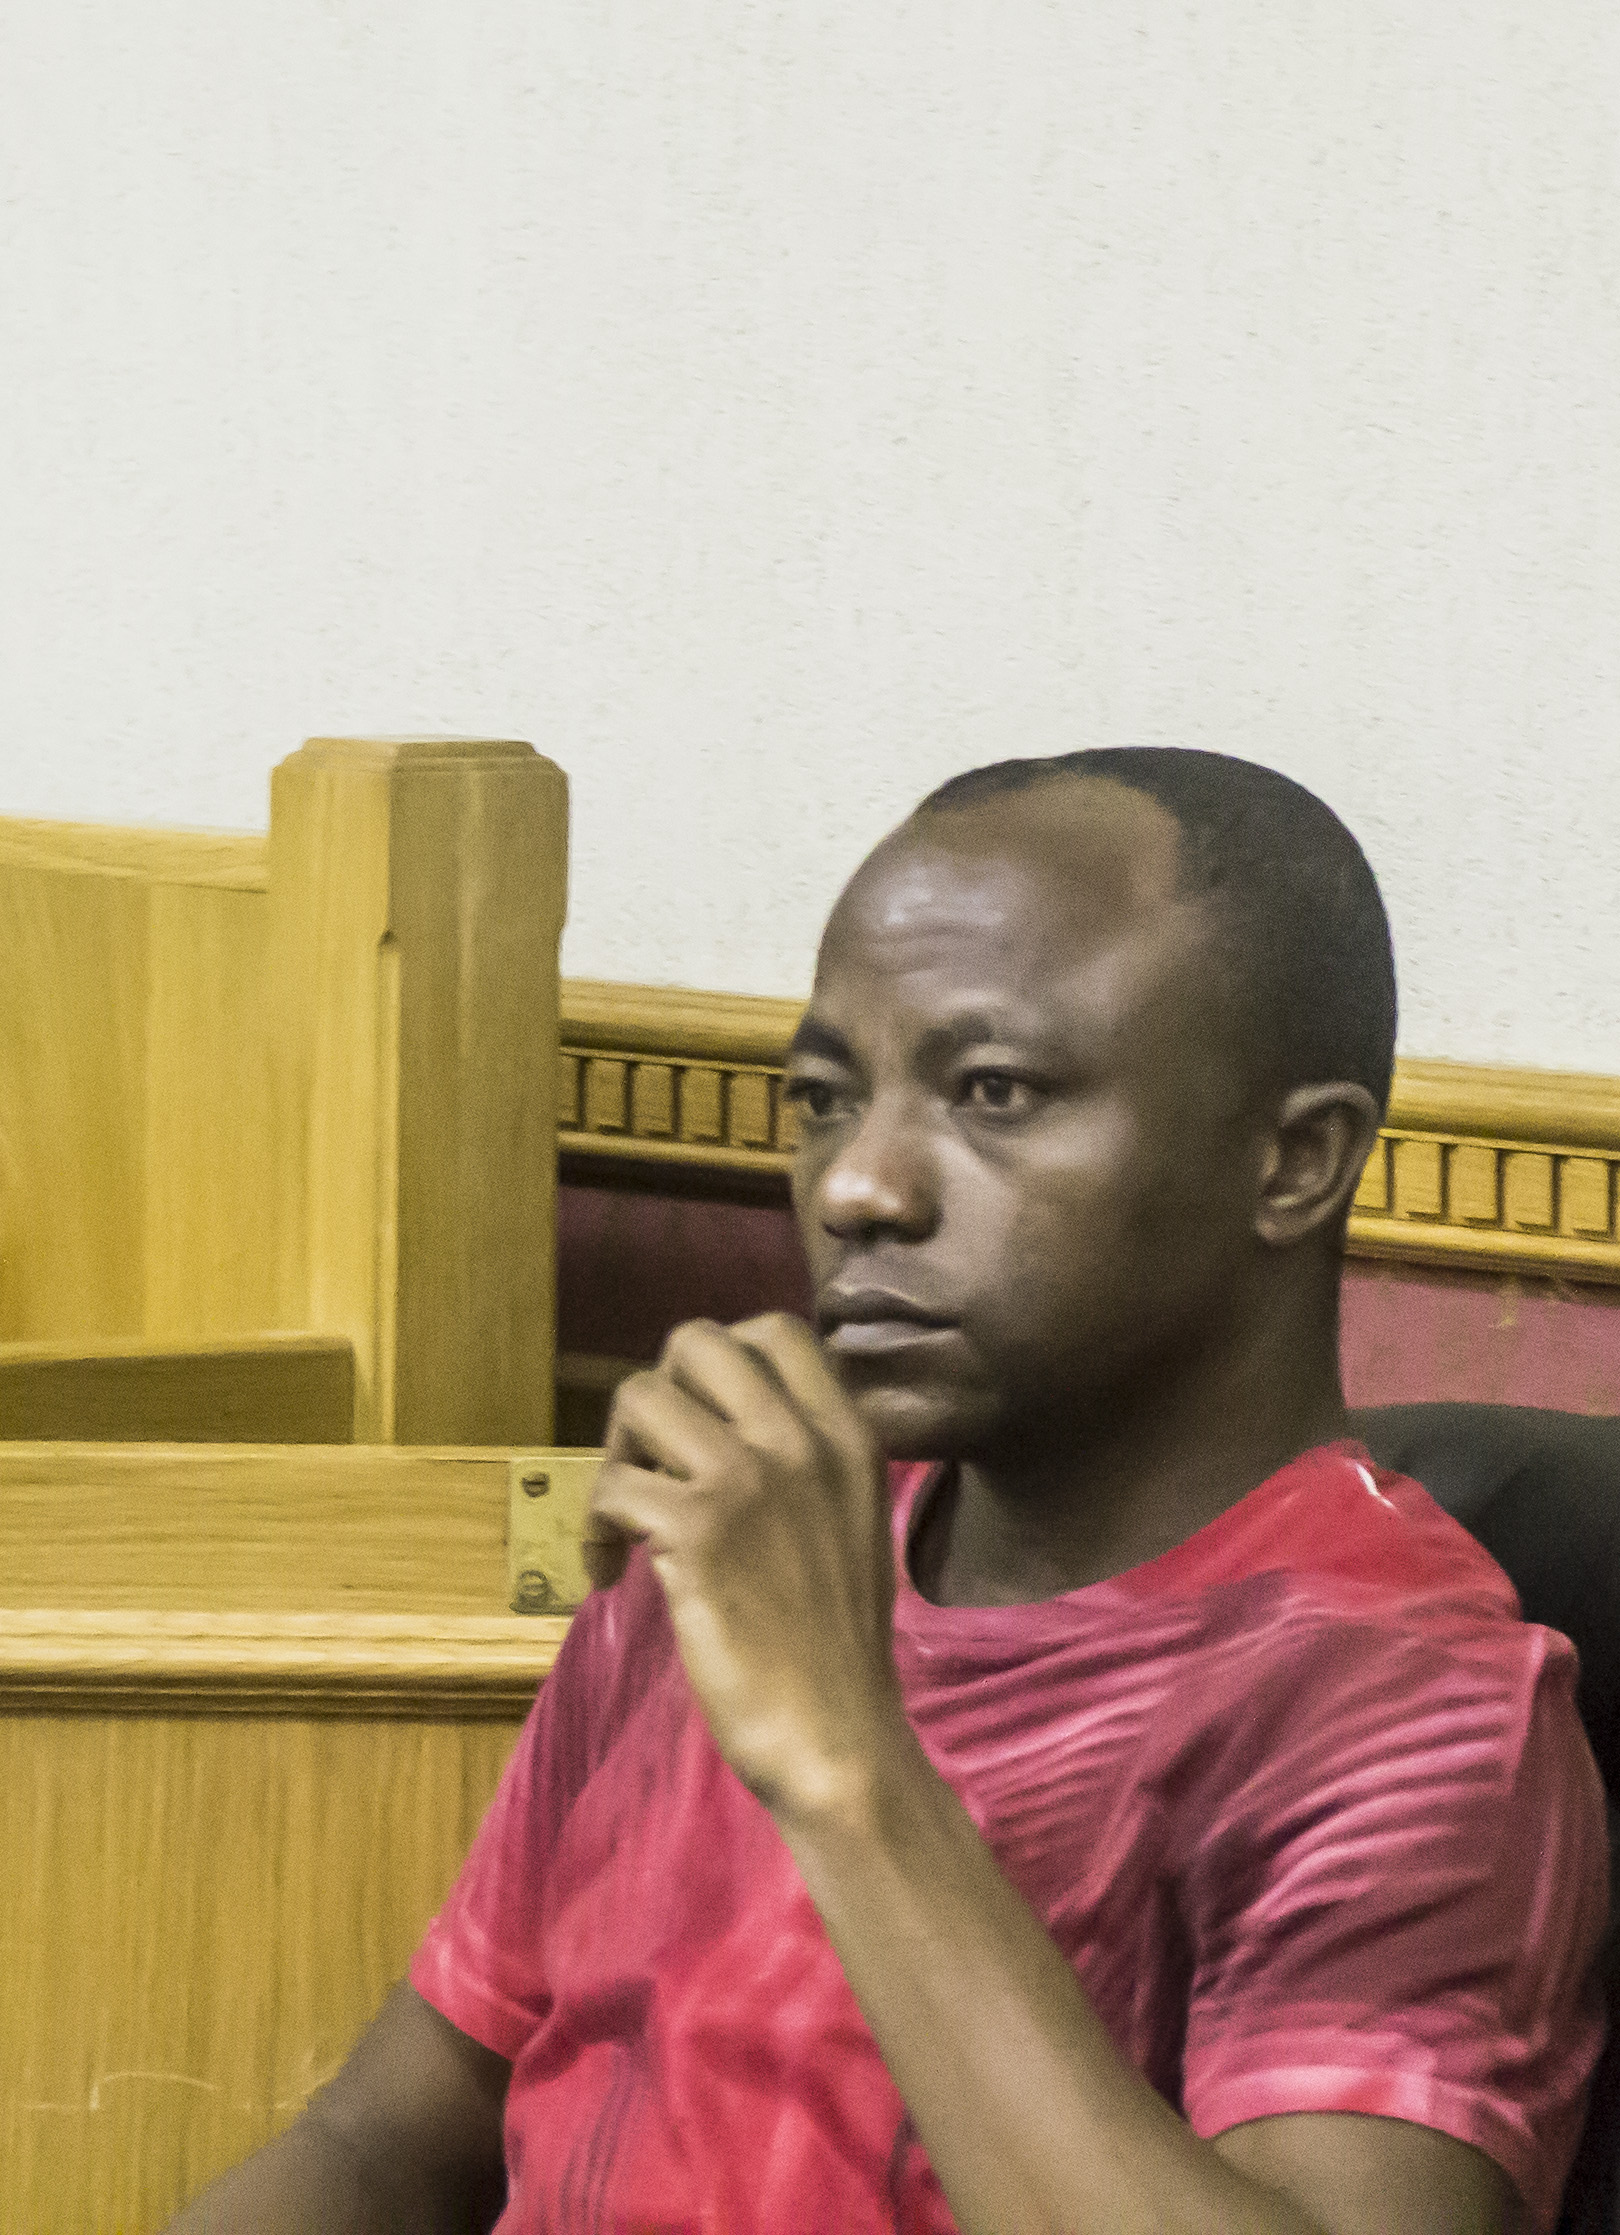 Convicted lover killer seeks appeal... Elia claims trial judge erred